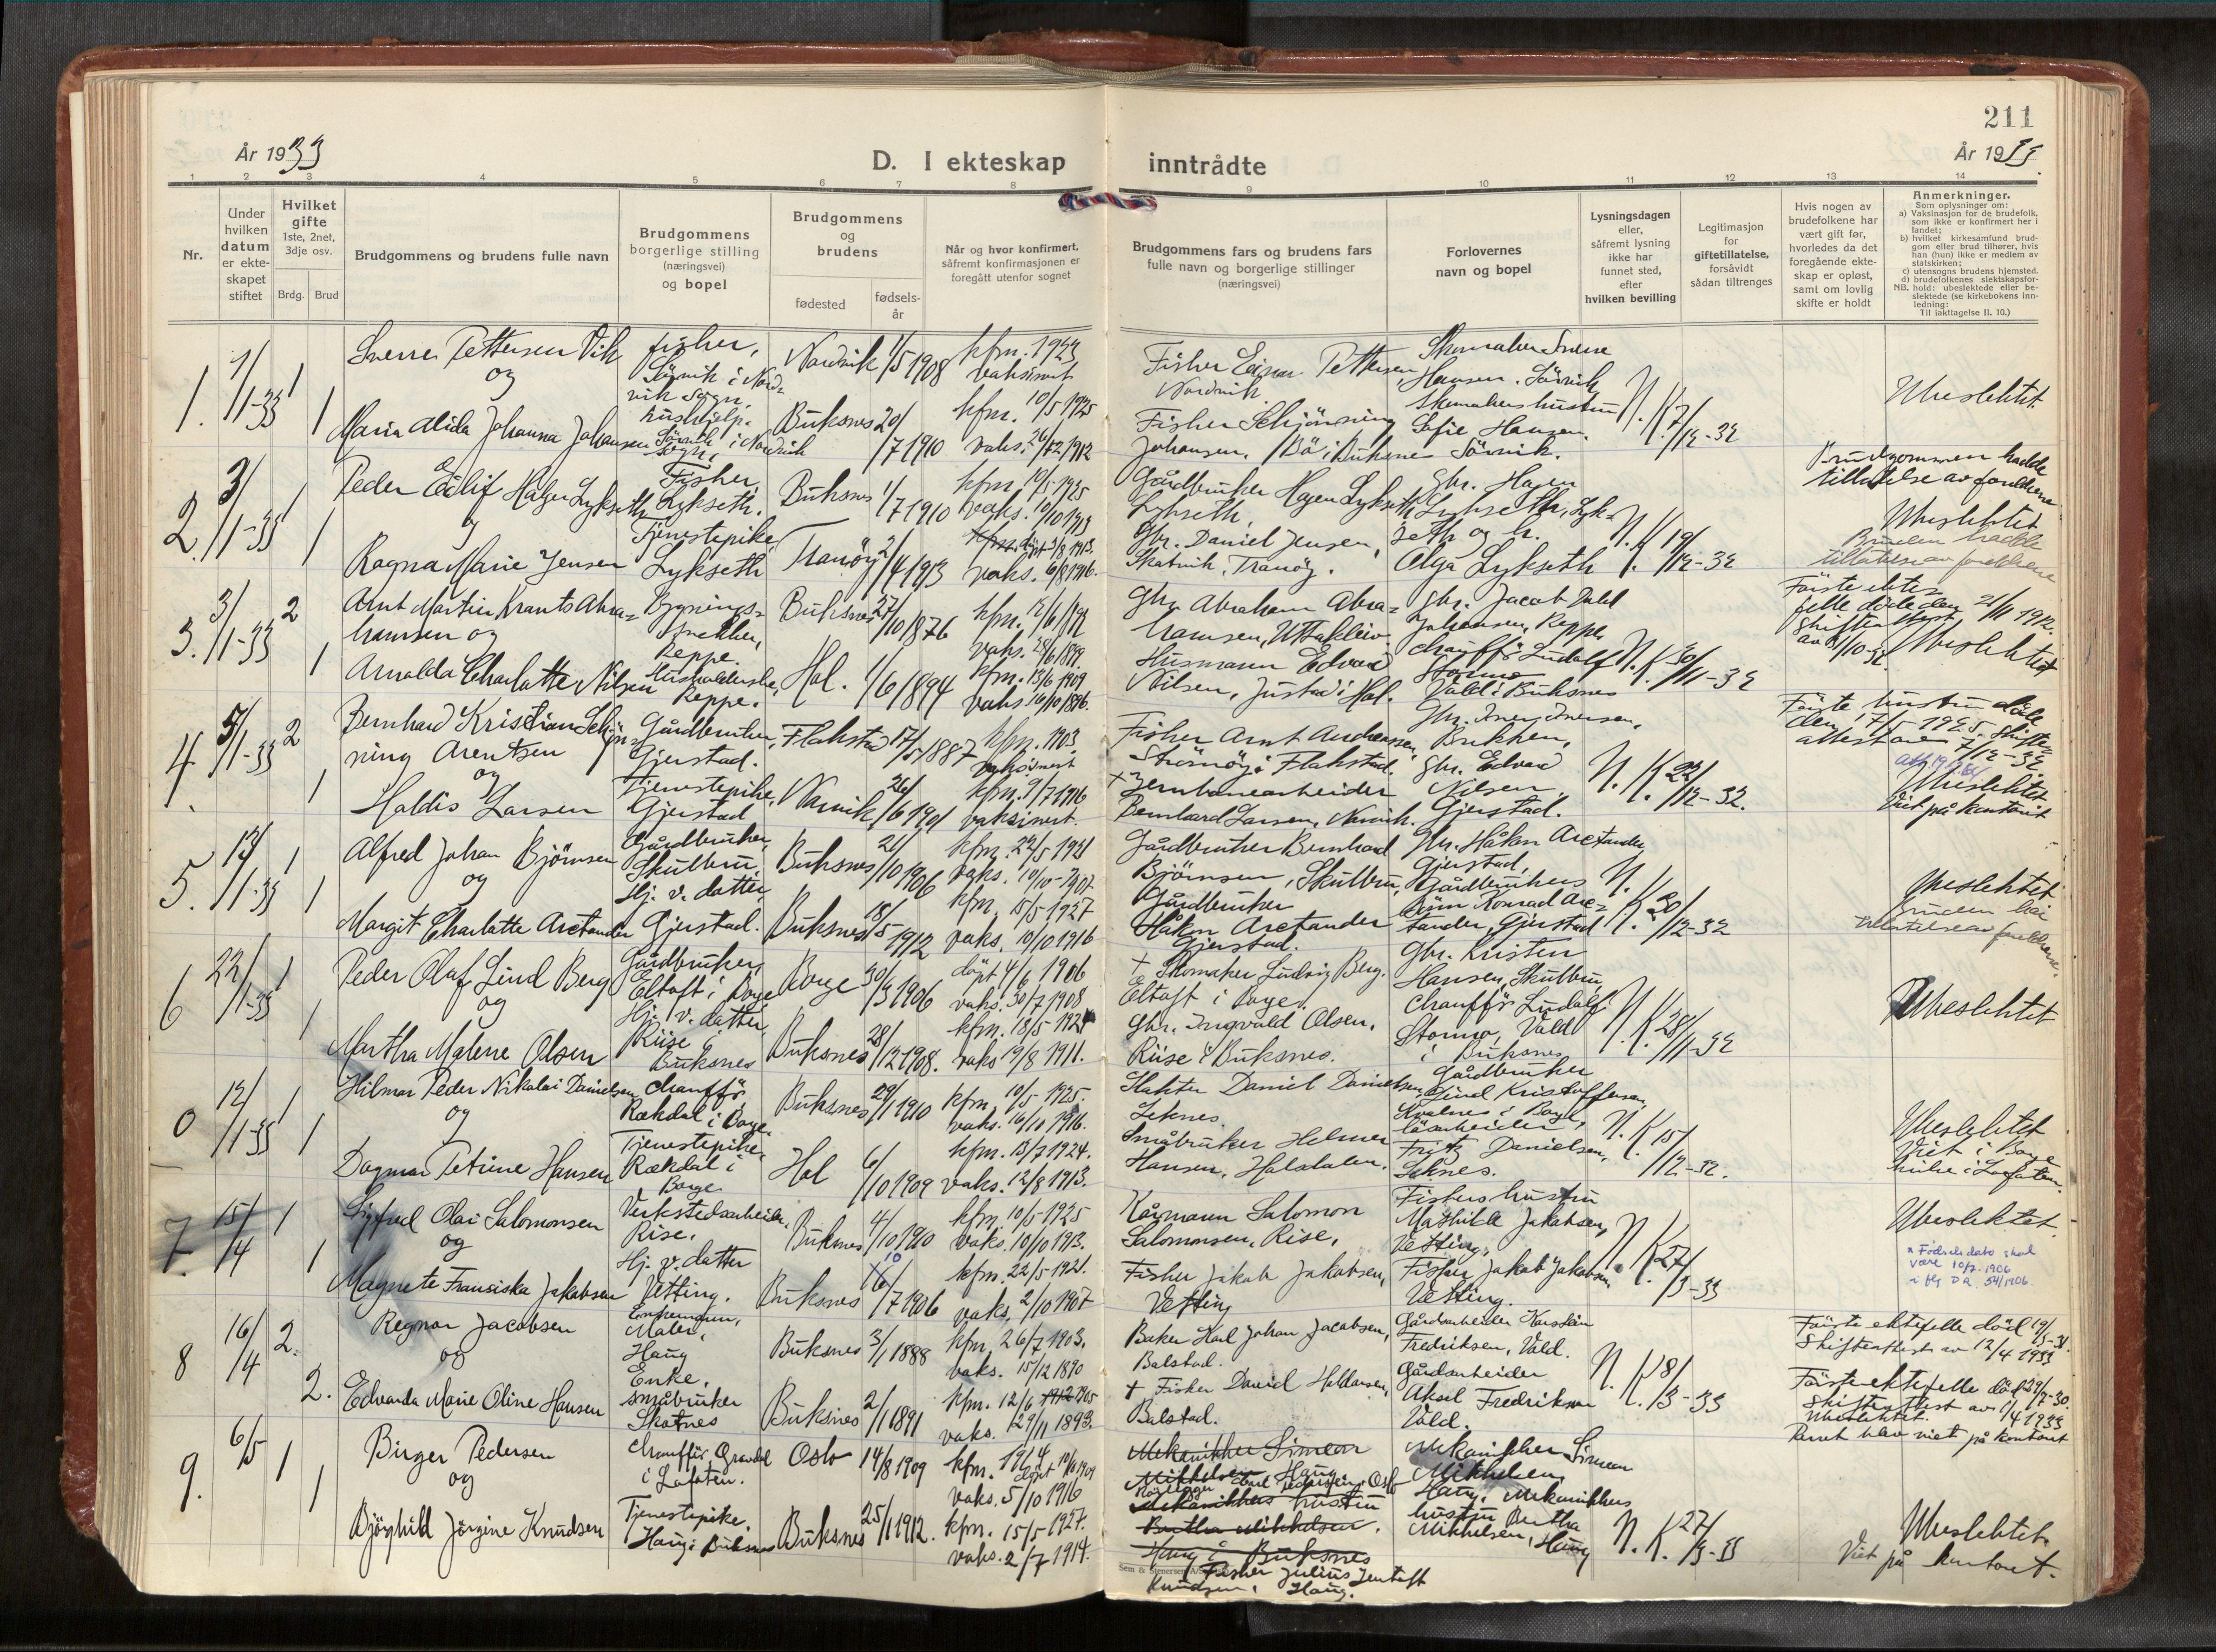 SAT, Ministerialprotokoller, klokkerbøker og fødselsregistre - Nordland, 881/L1161: Ministerialbok nr. 881A14, 1932-1955, s. 211